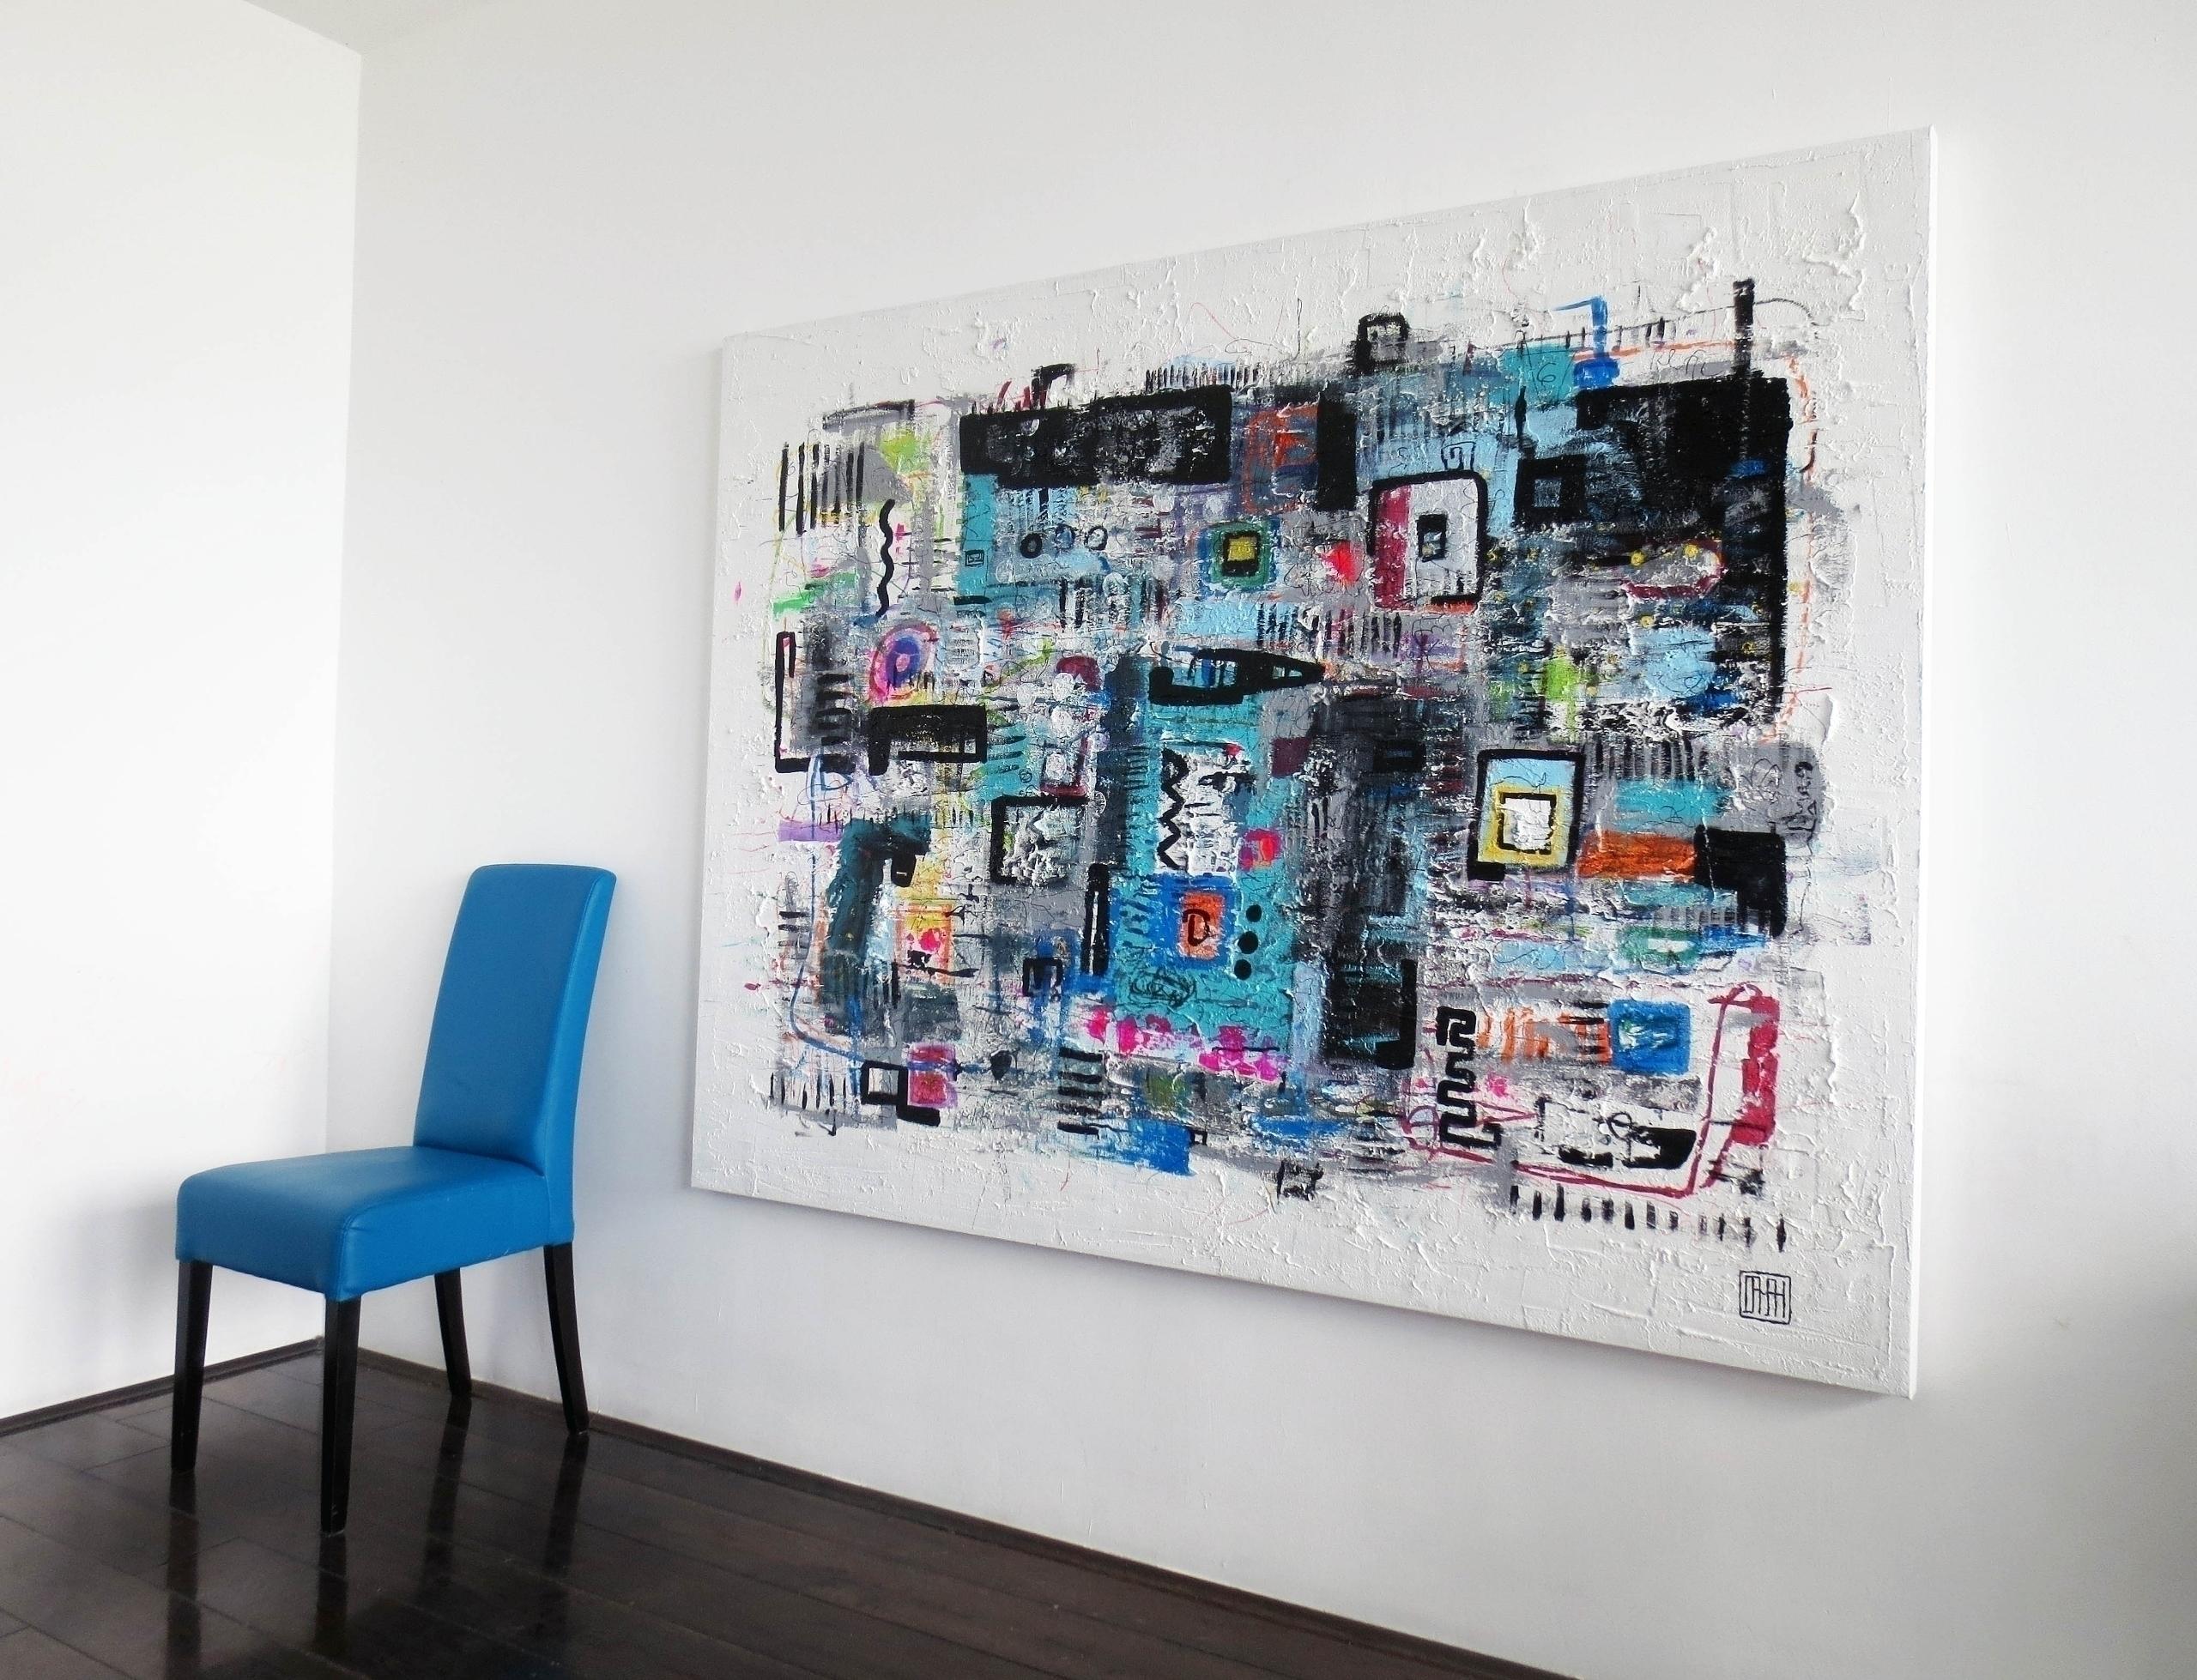 sold A117 acrylic canvas 140x18 - damianpavlovic | ello